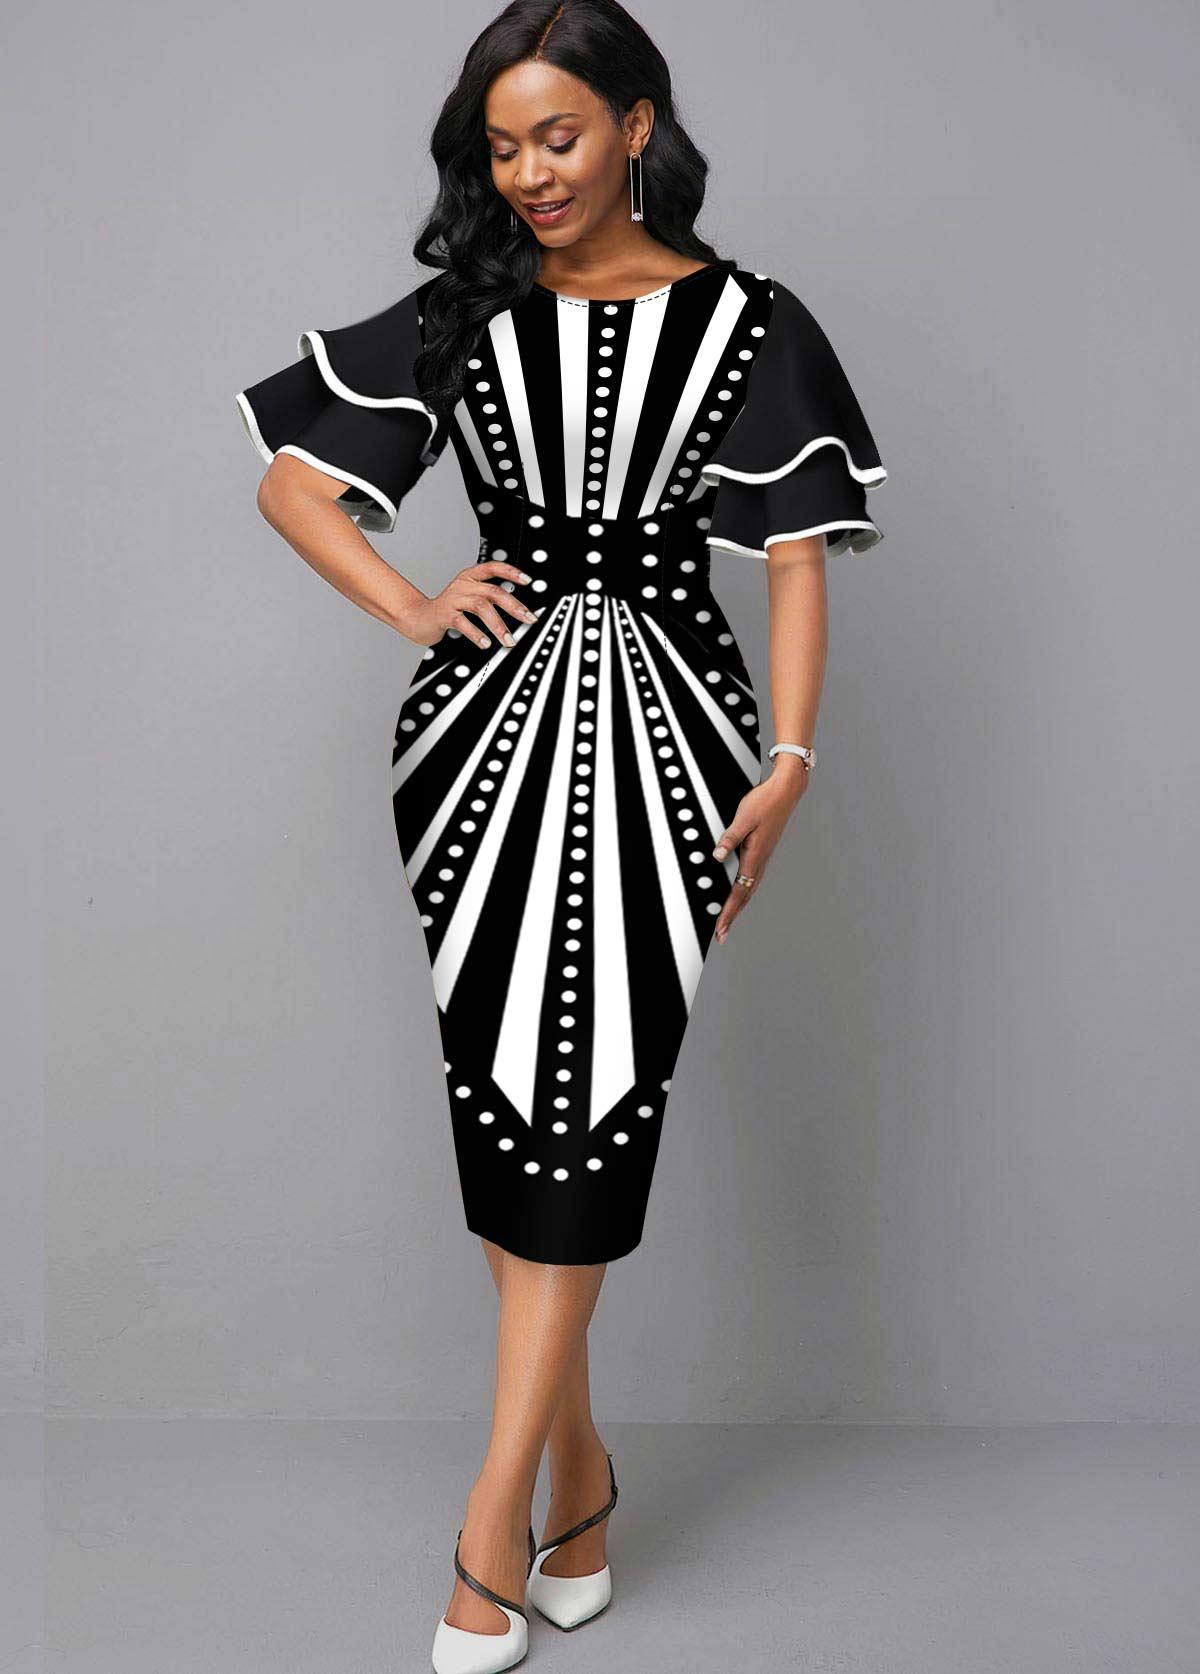 Radial Print Round Neck Sheath Dress